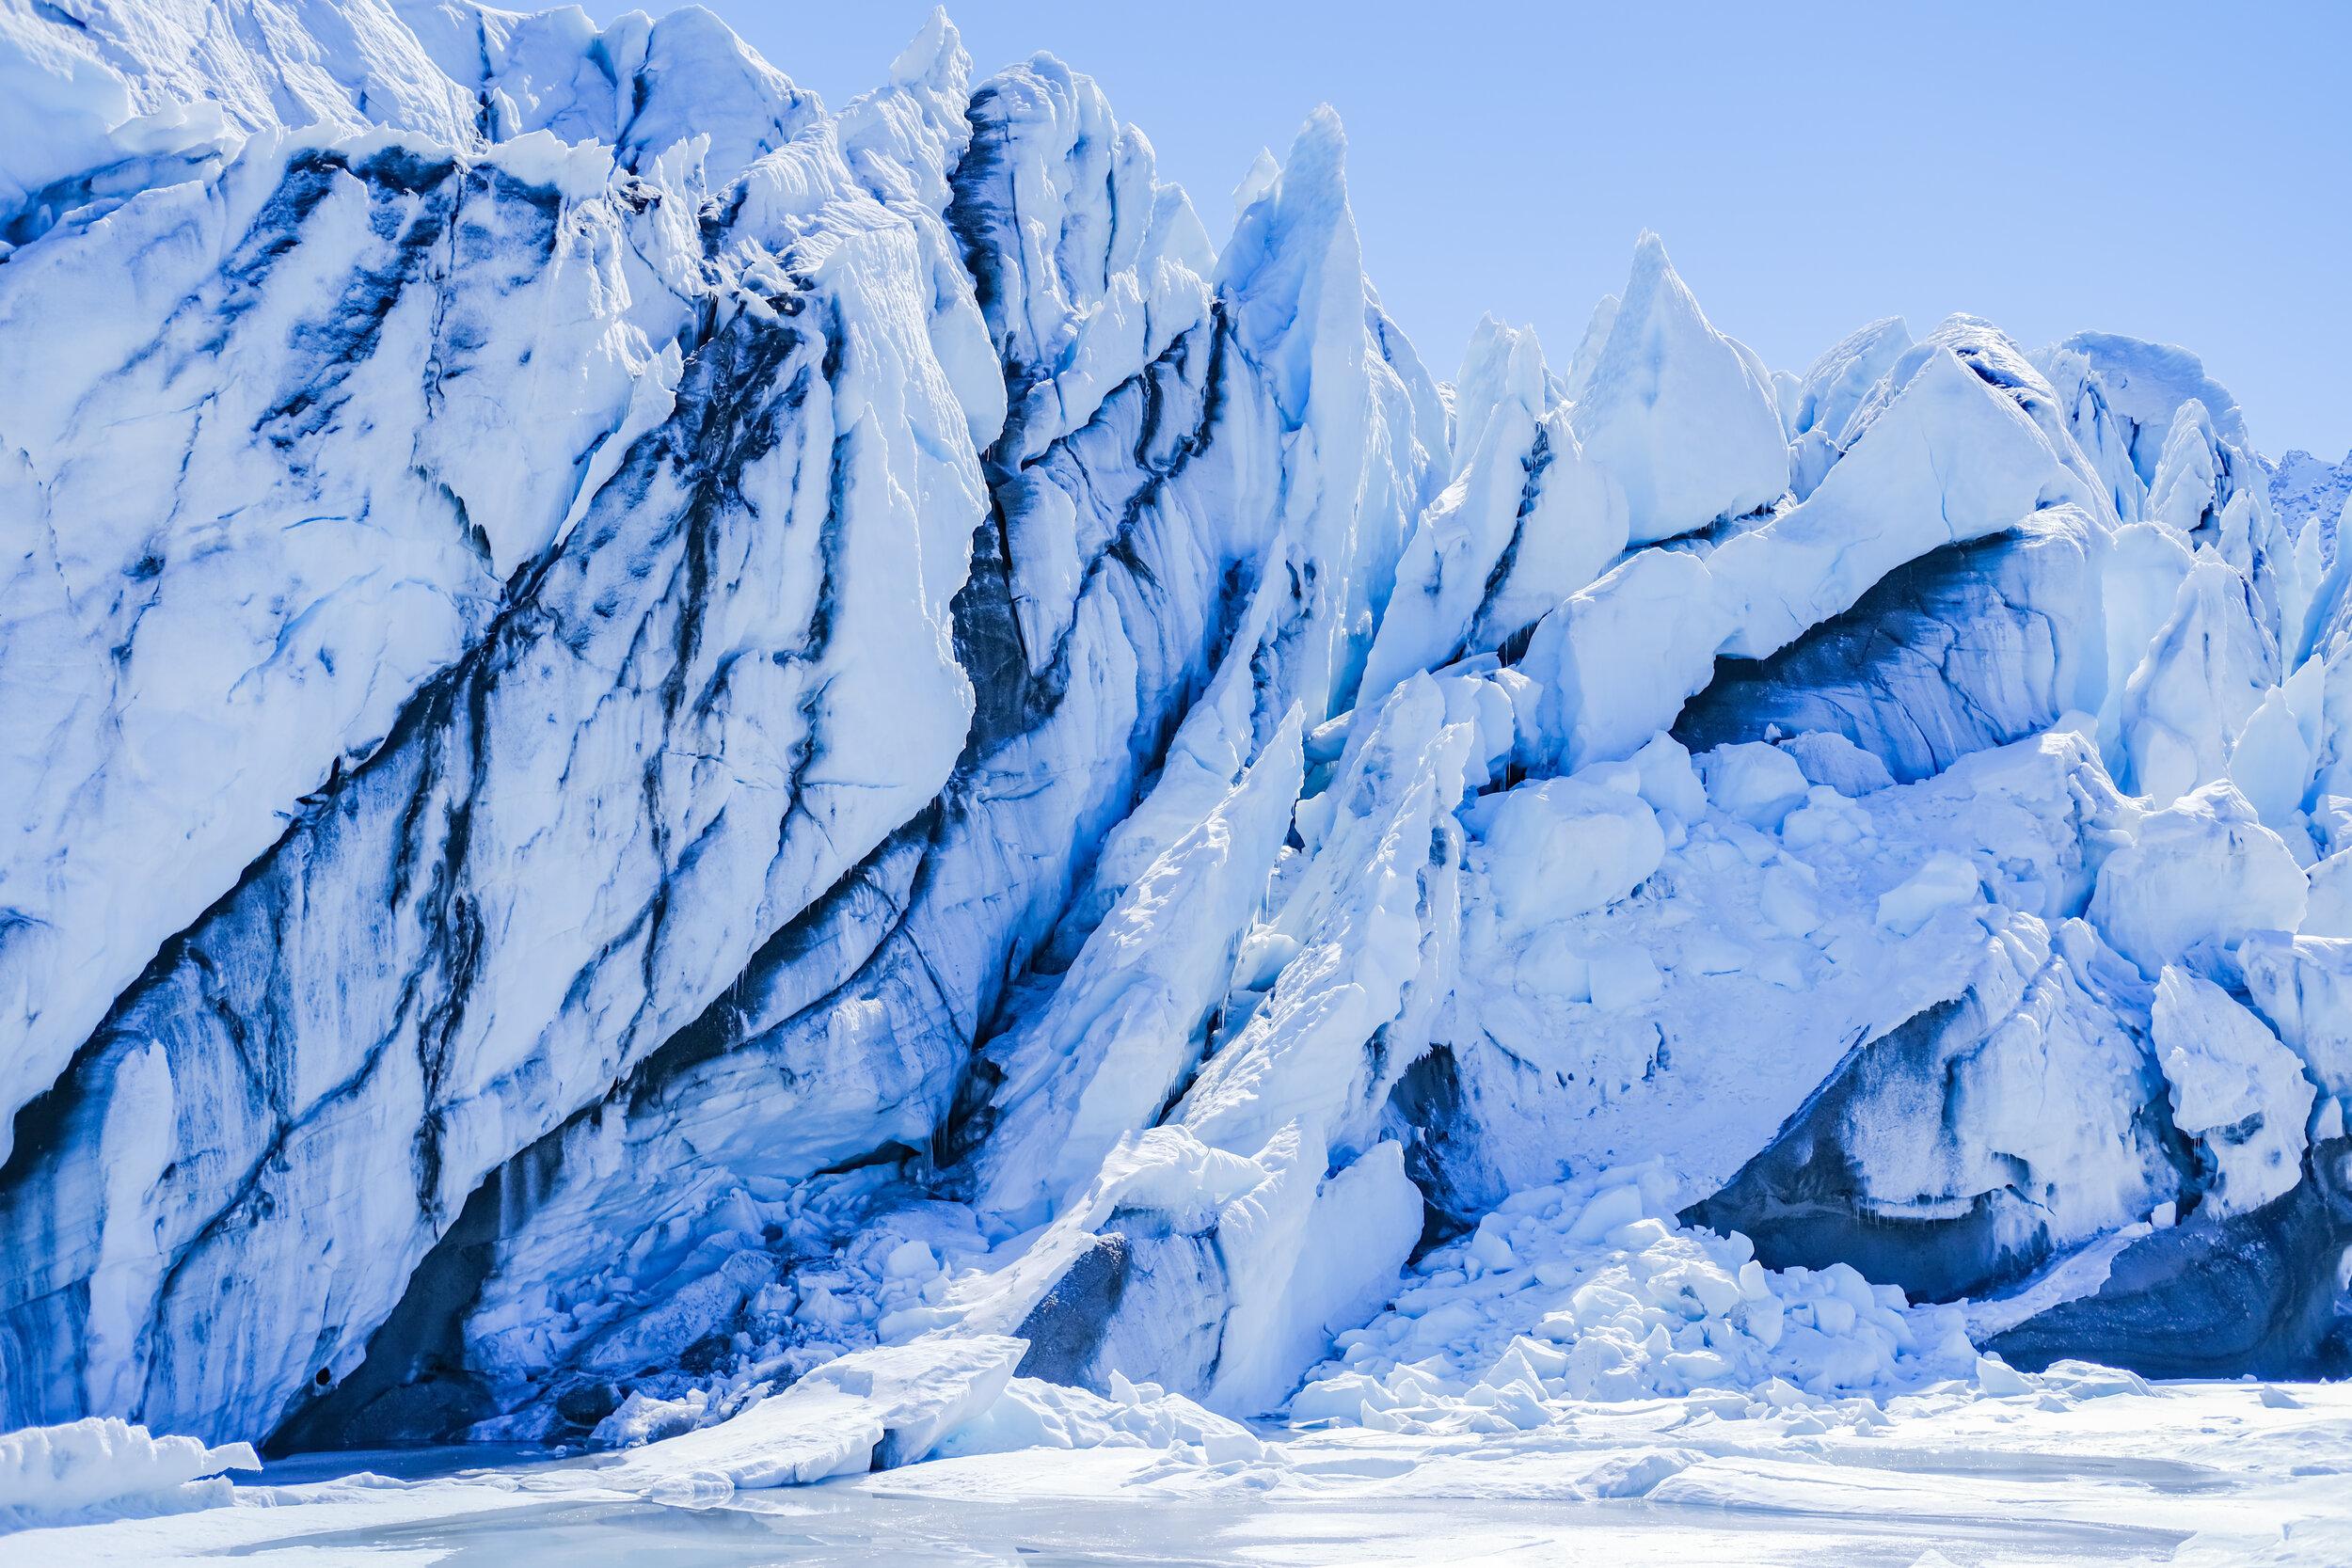 Engagement_Session_Matanuska_Glacier_Alaska_Emily_Lester_Photography-732.jpg